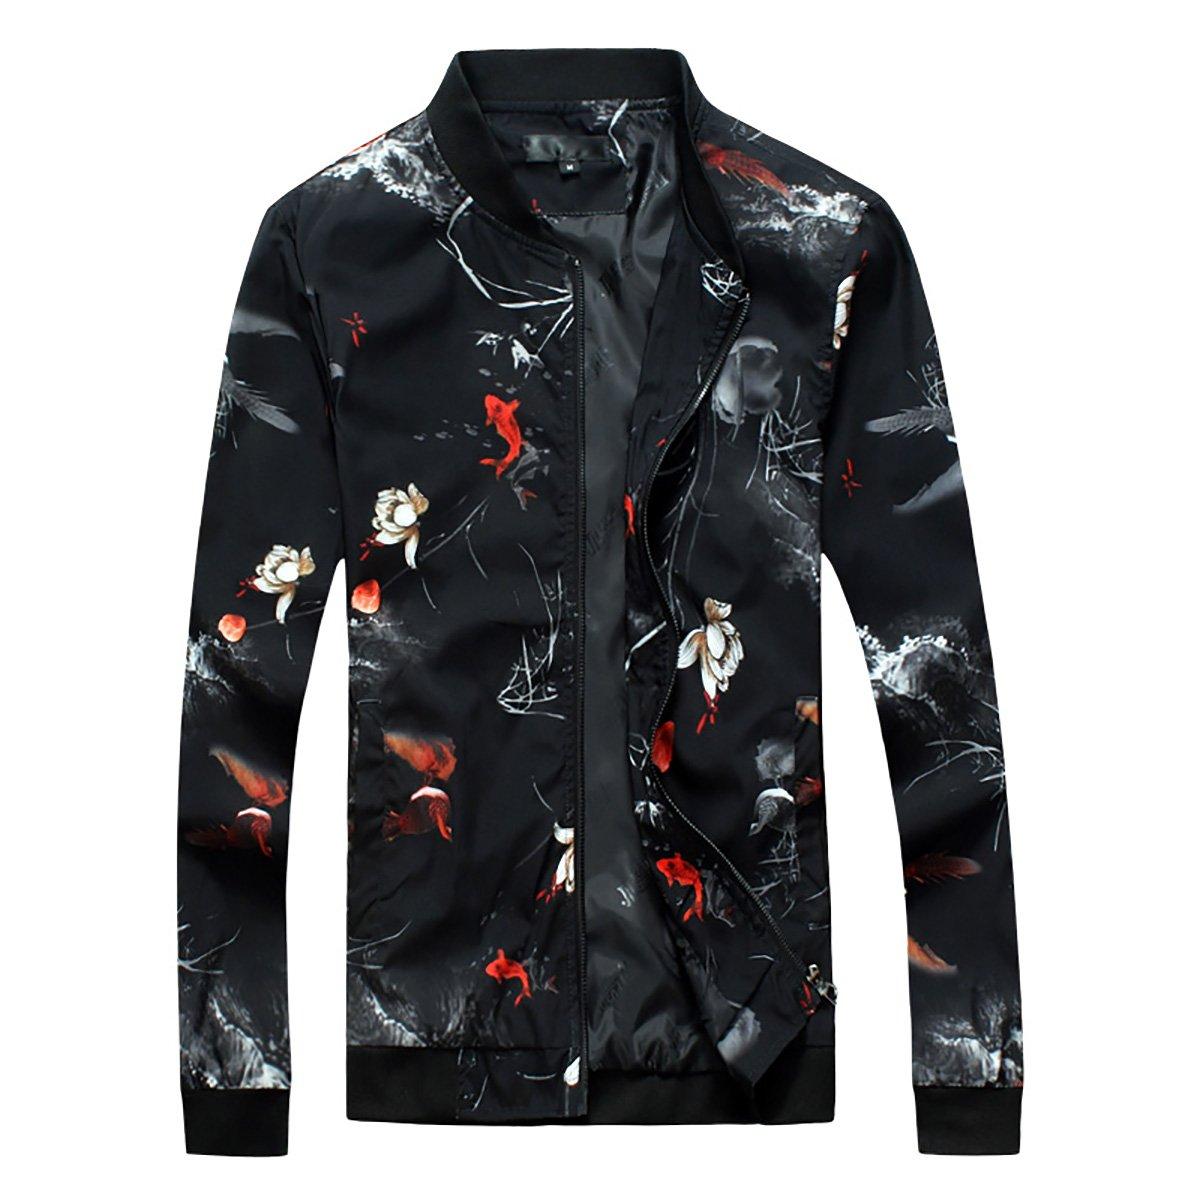 Cloudstyle Mens Casual Slim Fit Lightweight Floral Jacket Sportswear Bomber Jacket 04Jacket